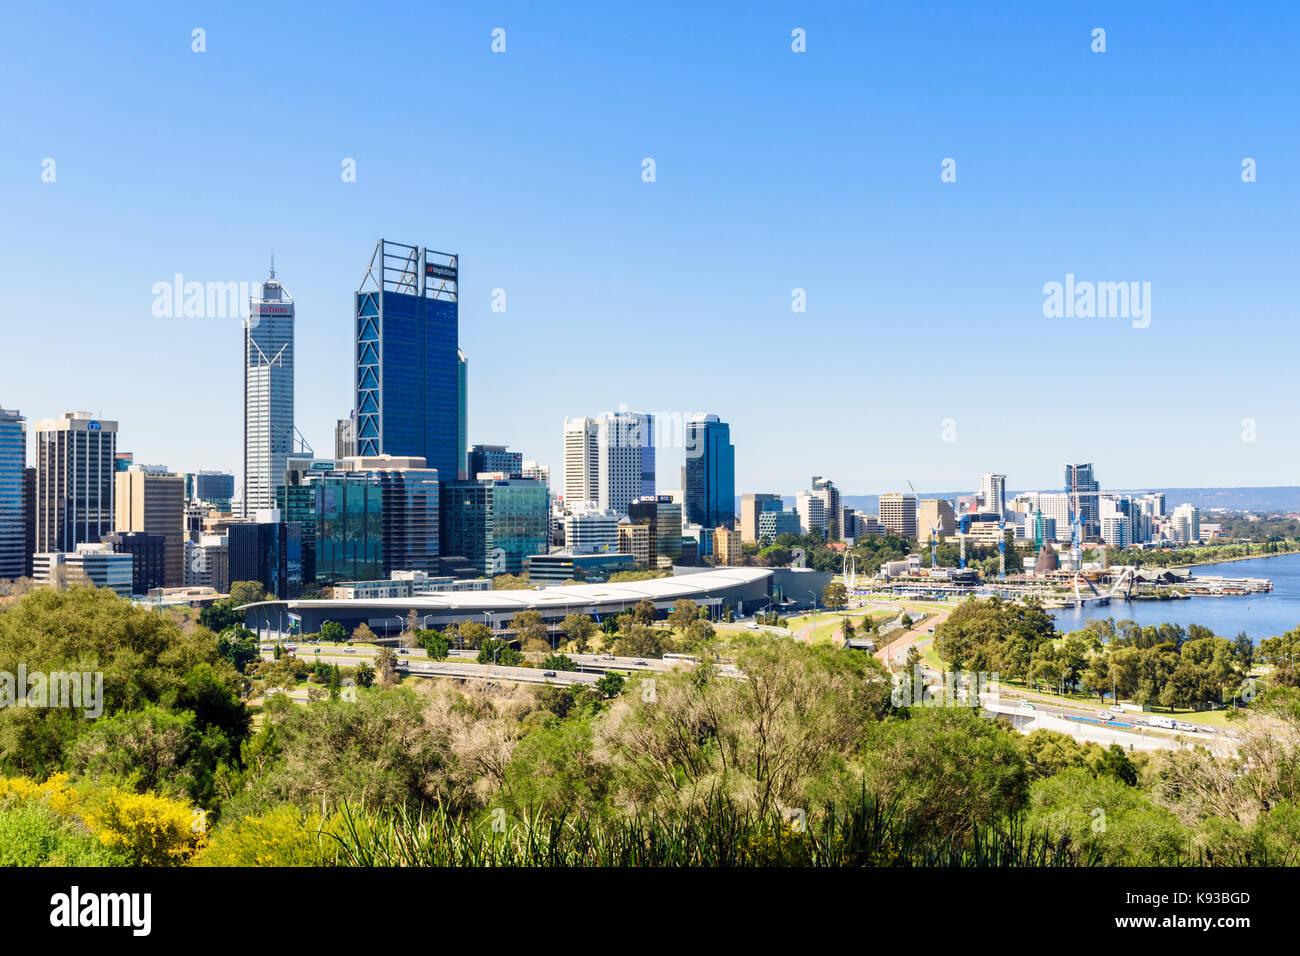 View of the Perth city CBD from Kings Park, Western Australia, Australia - Stock Image